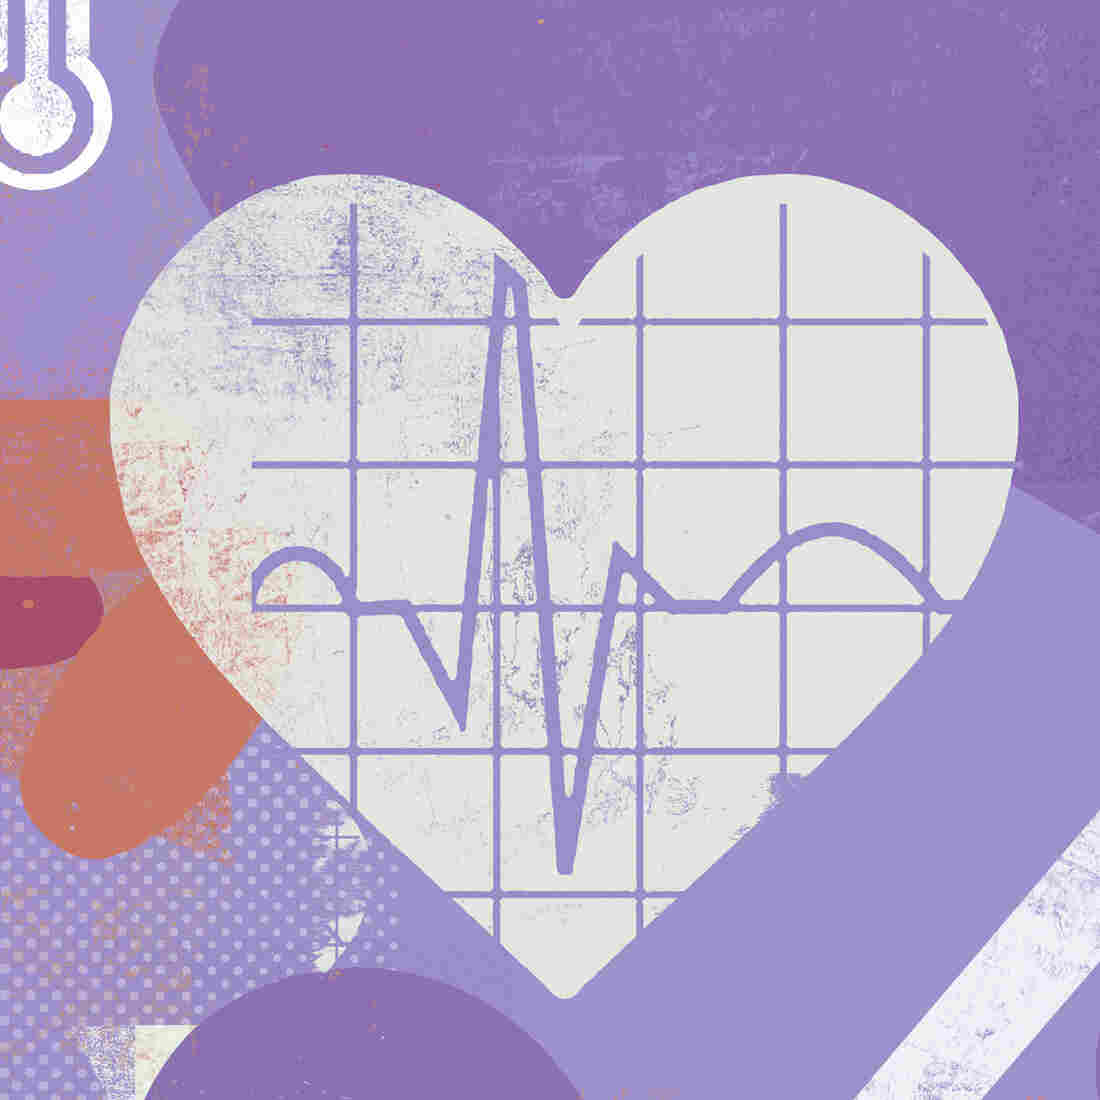 Online Health Searches Aren't Always Confidential